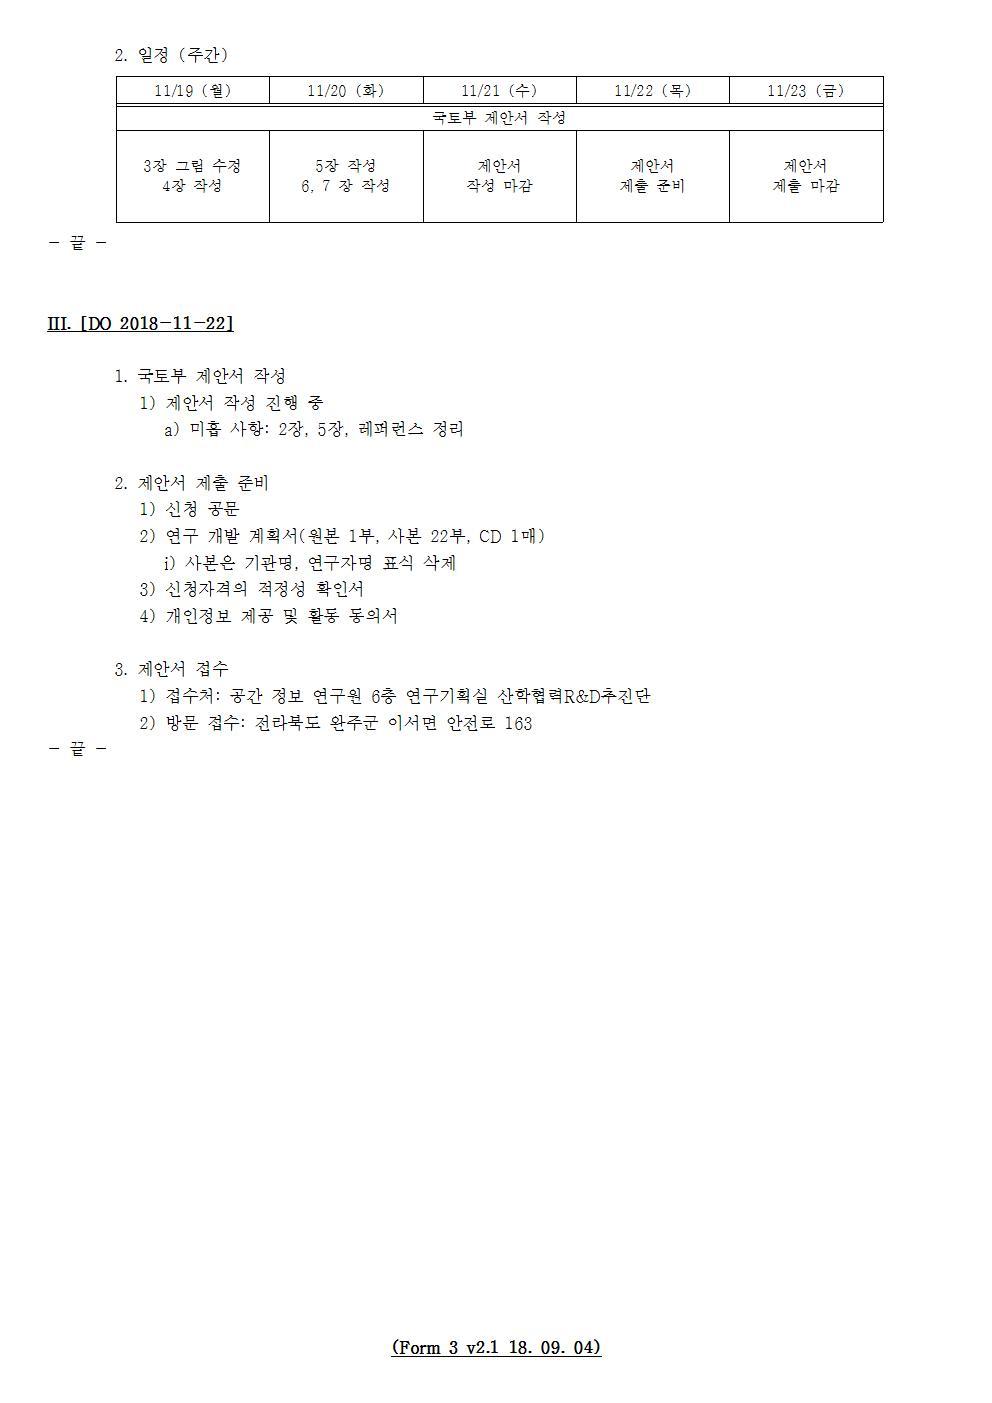 D-[18-056-RD-12]-[국토부_과제_제안서]-[2018-11-22][JS]002.jpg